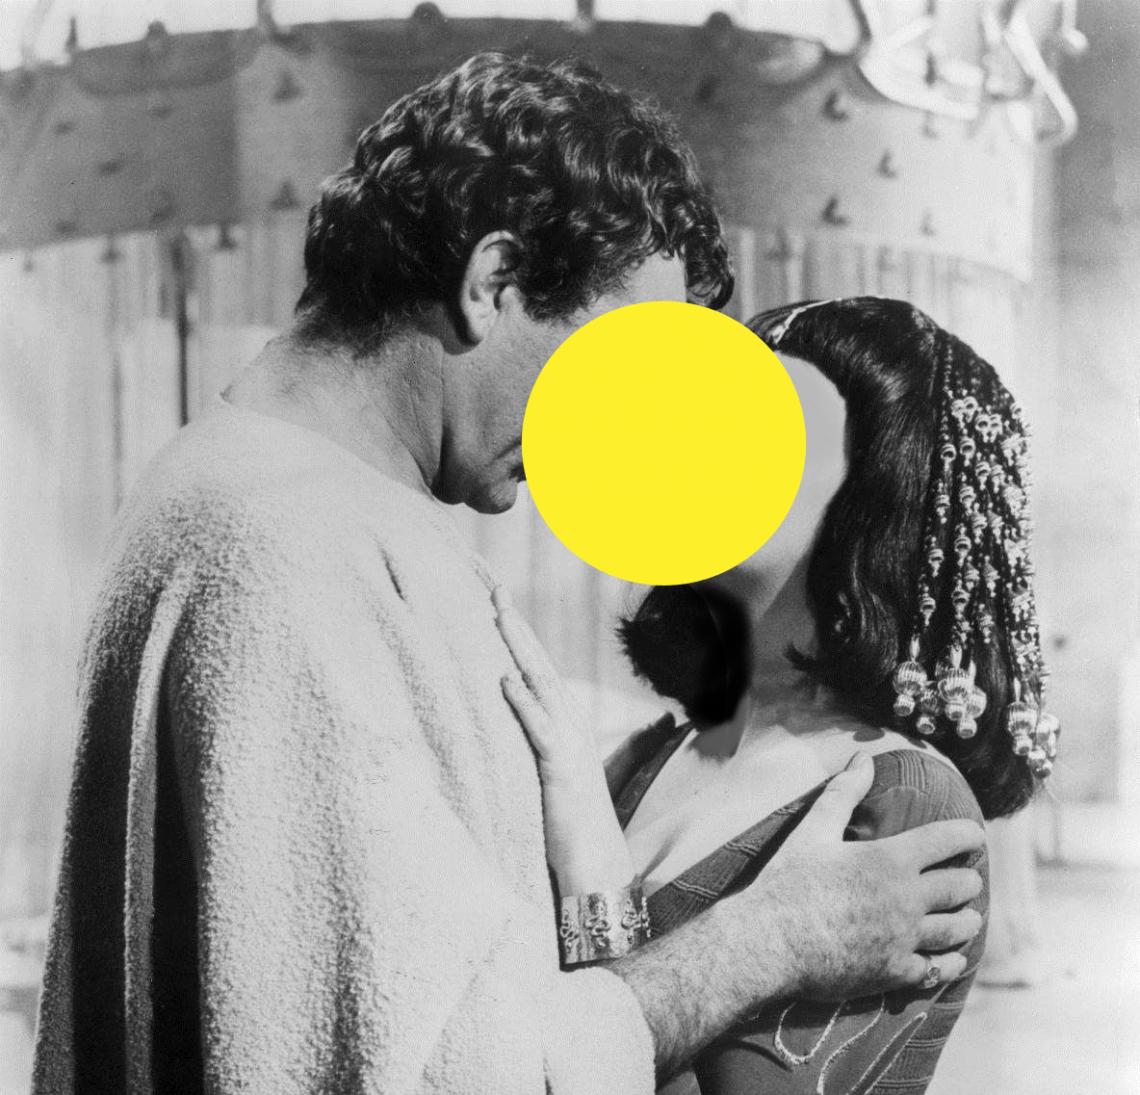 Antonio e Cleopatra Paschitto